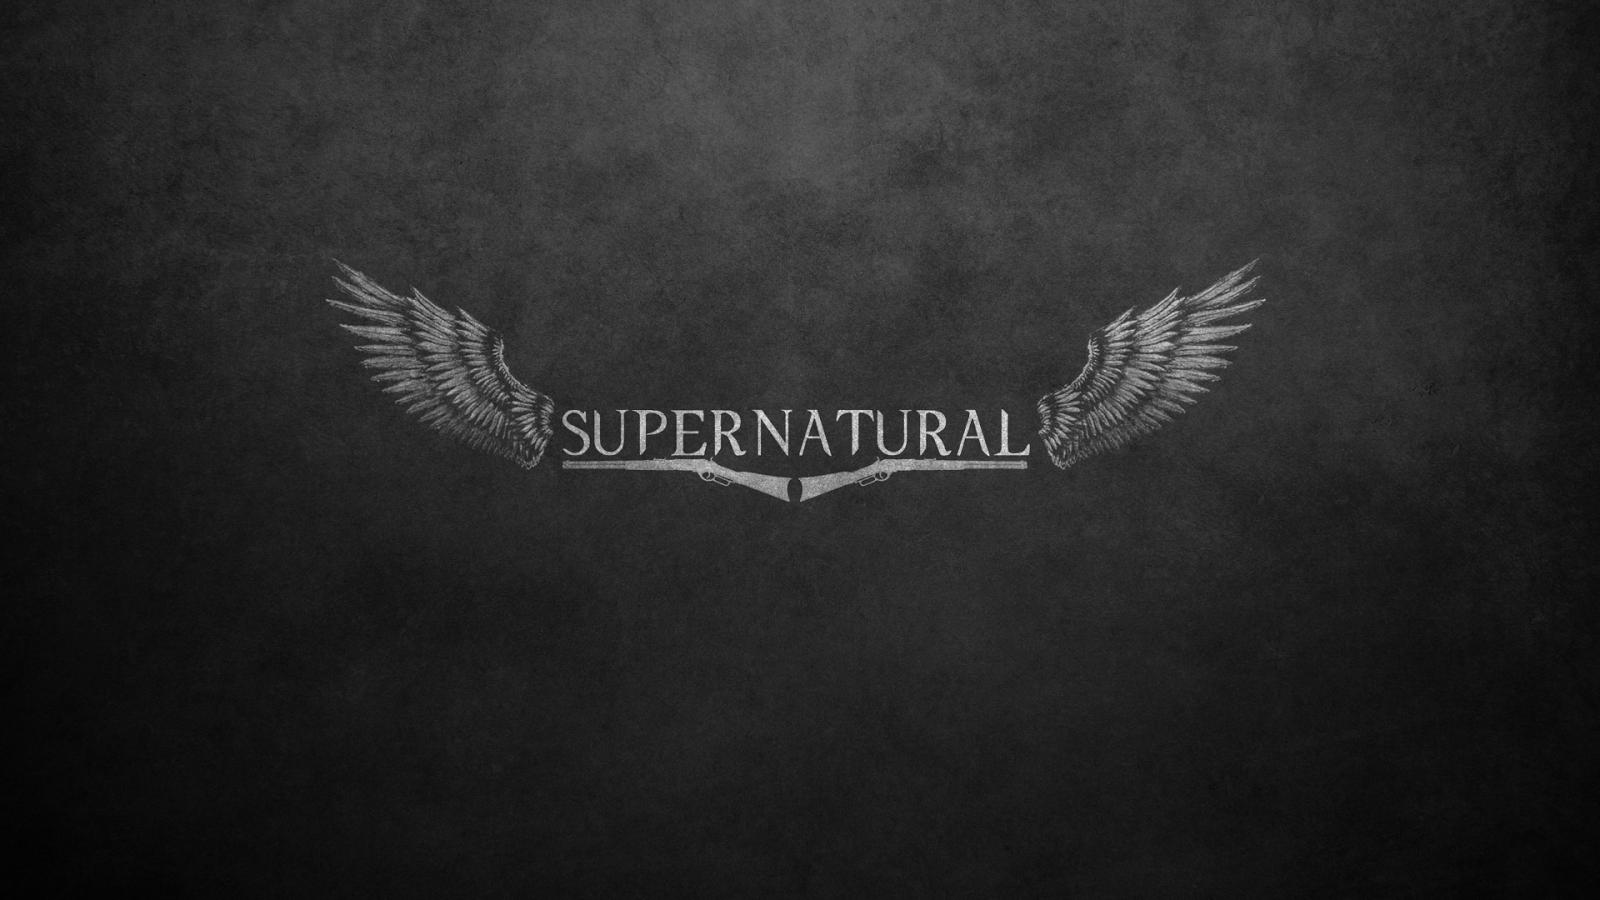 Hd Wallpapers Süpernatural Hd Wallpapers And Desktop